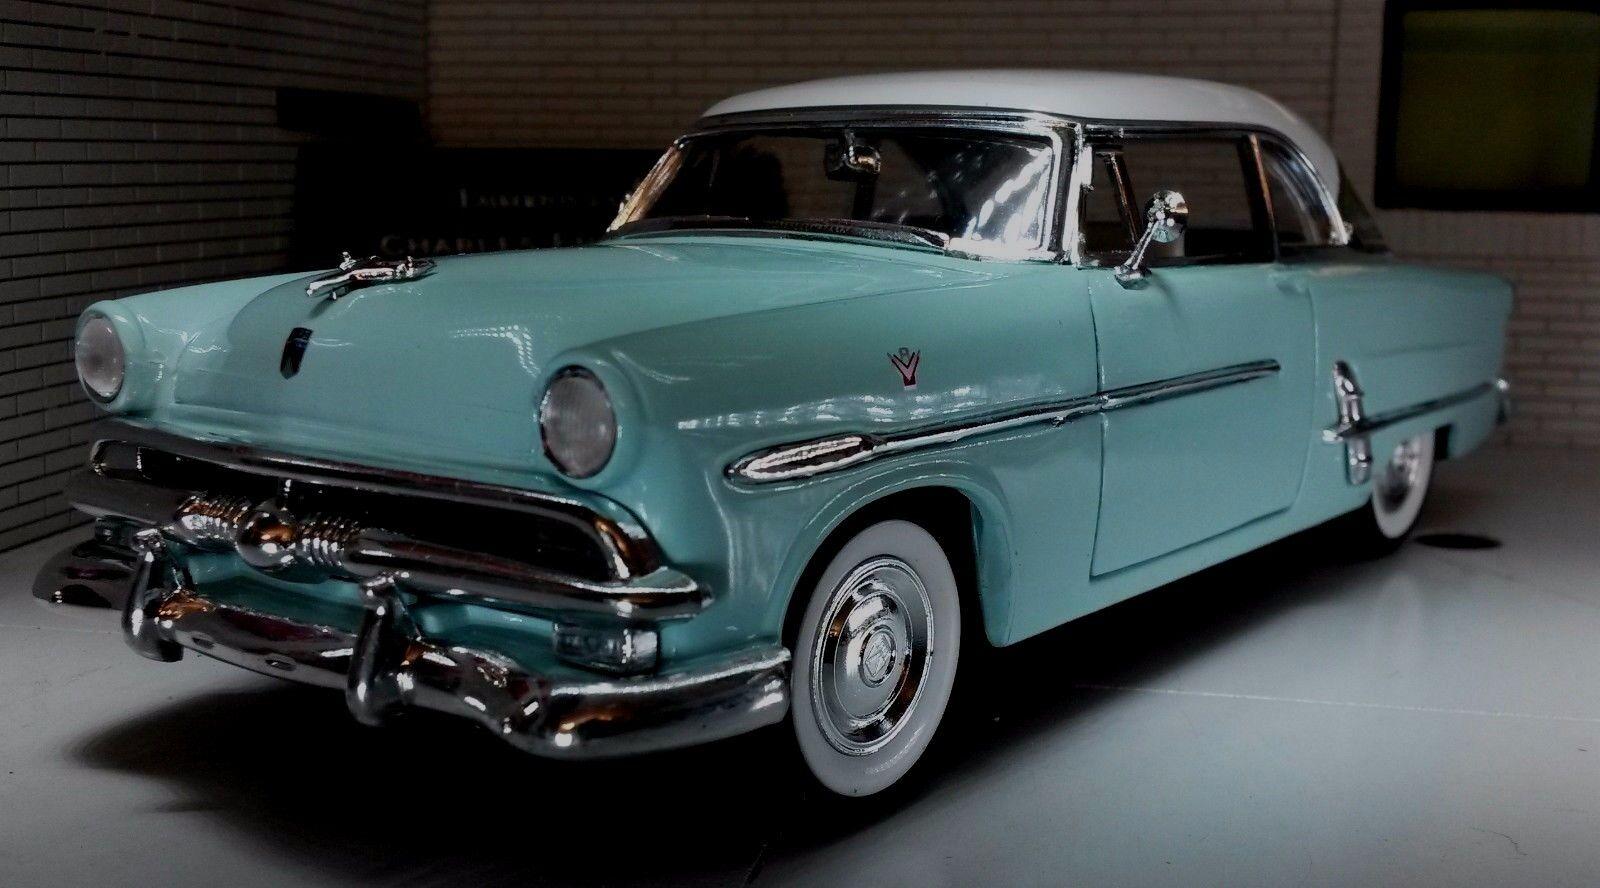 LGB G 1 24 Scale Ford Crestline Victoria 1953 Mint White Diecast Detailed Model